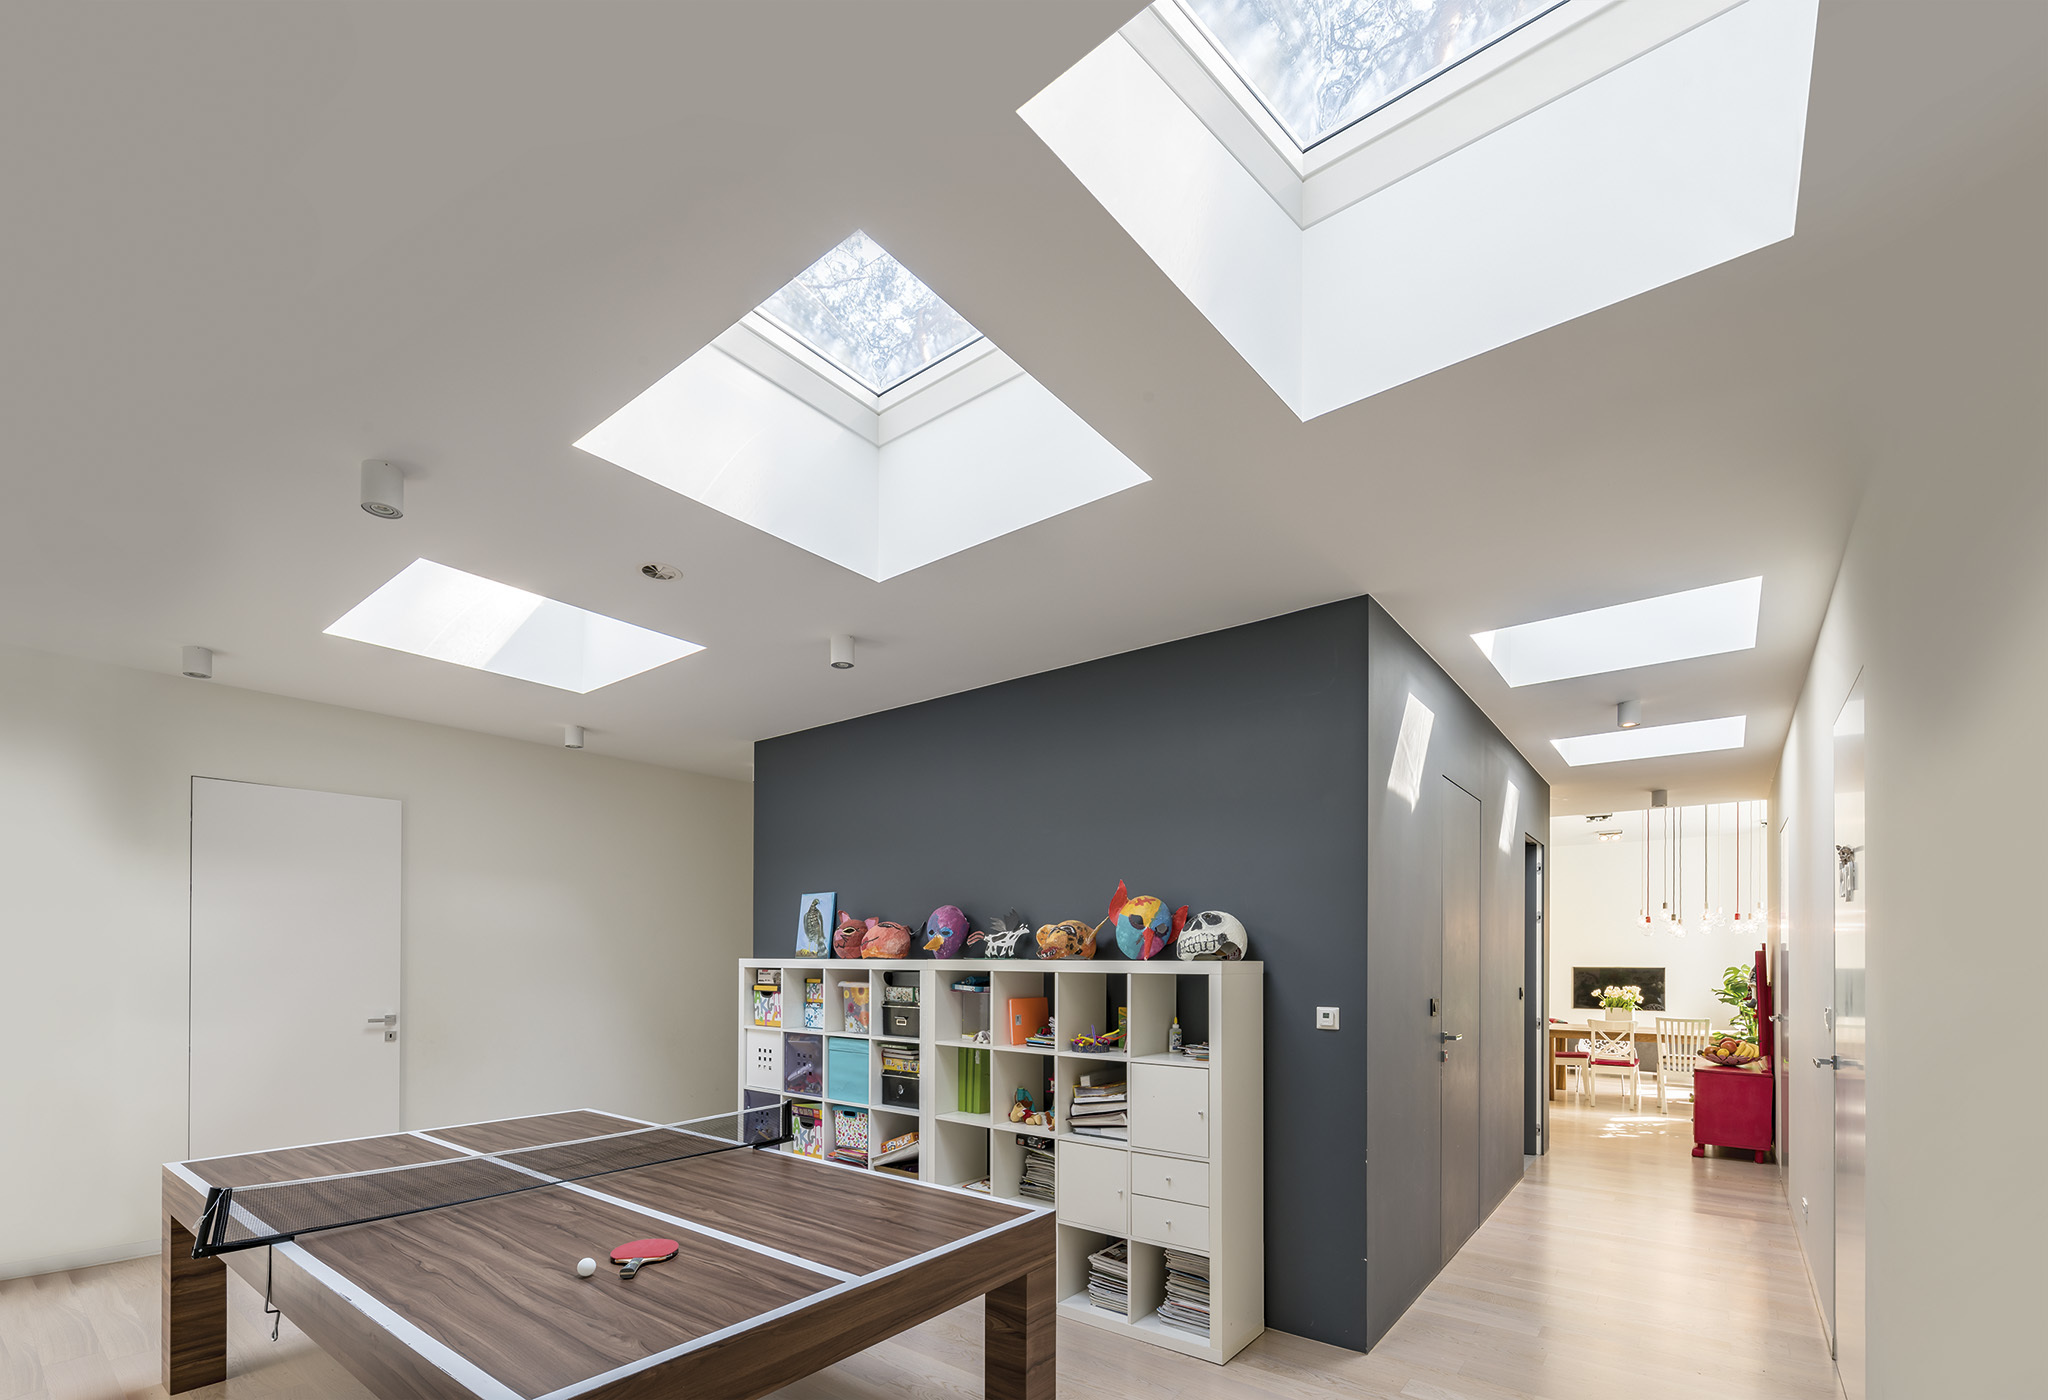 Flat roof window in playroom